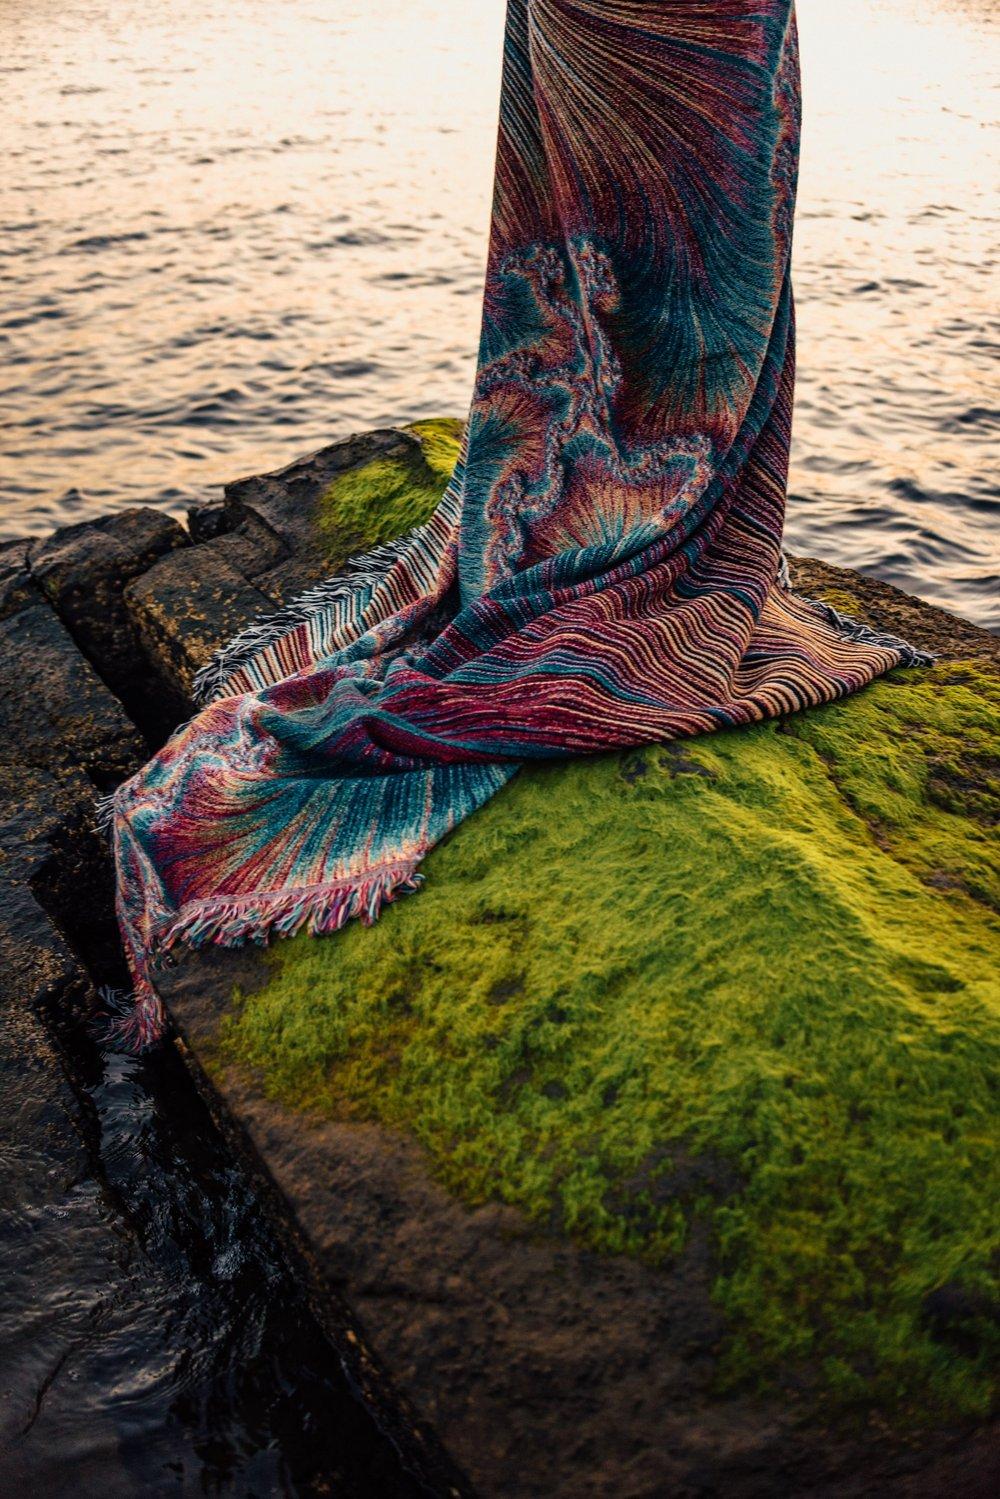 XL Woven Blanket #6